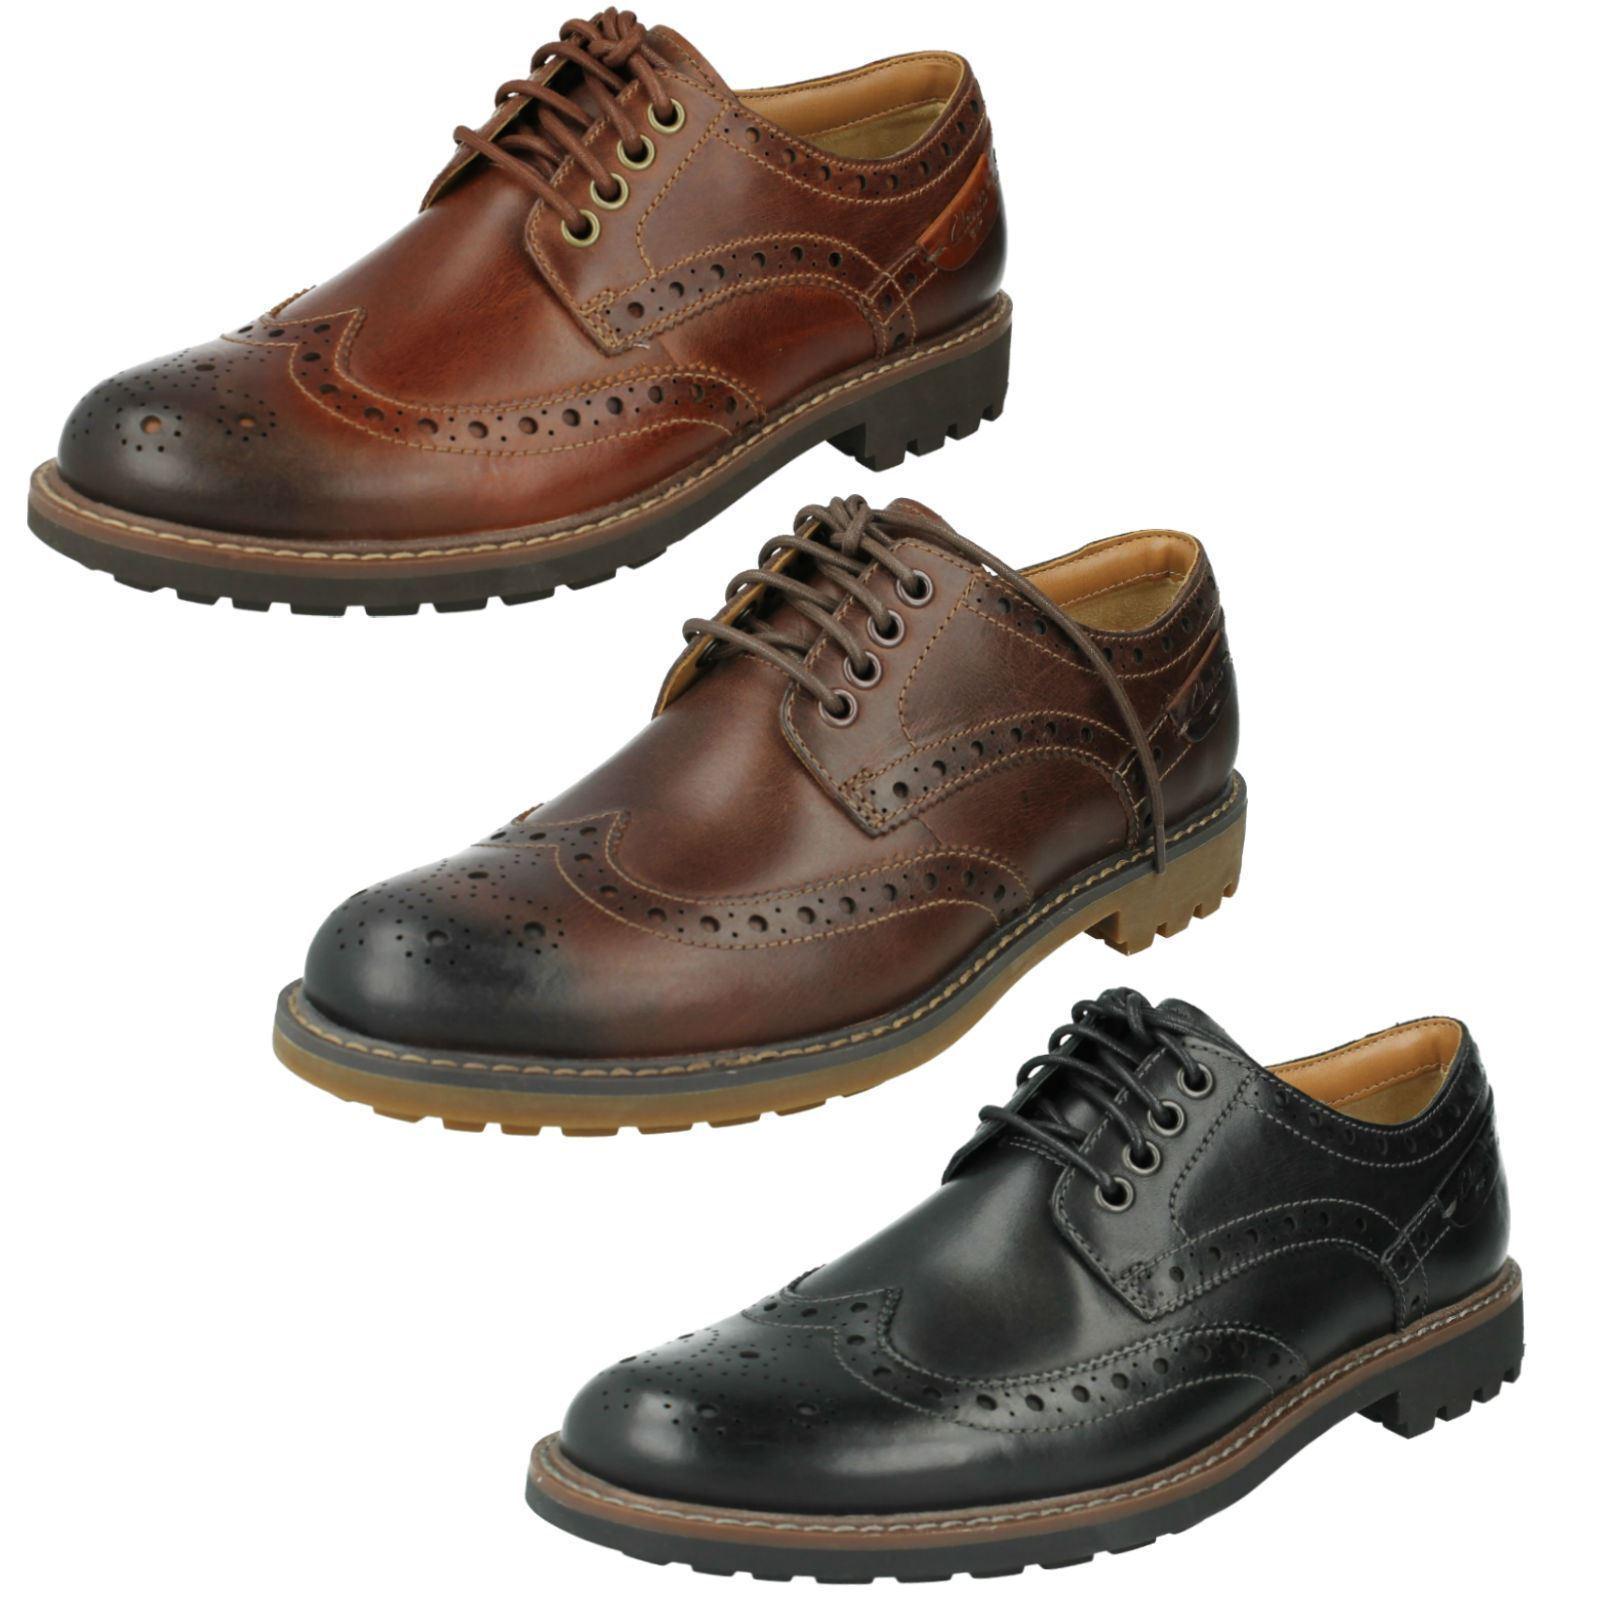 Men's Clarks Formal Shoes Montacute Wing